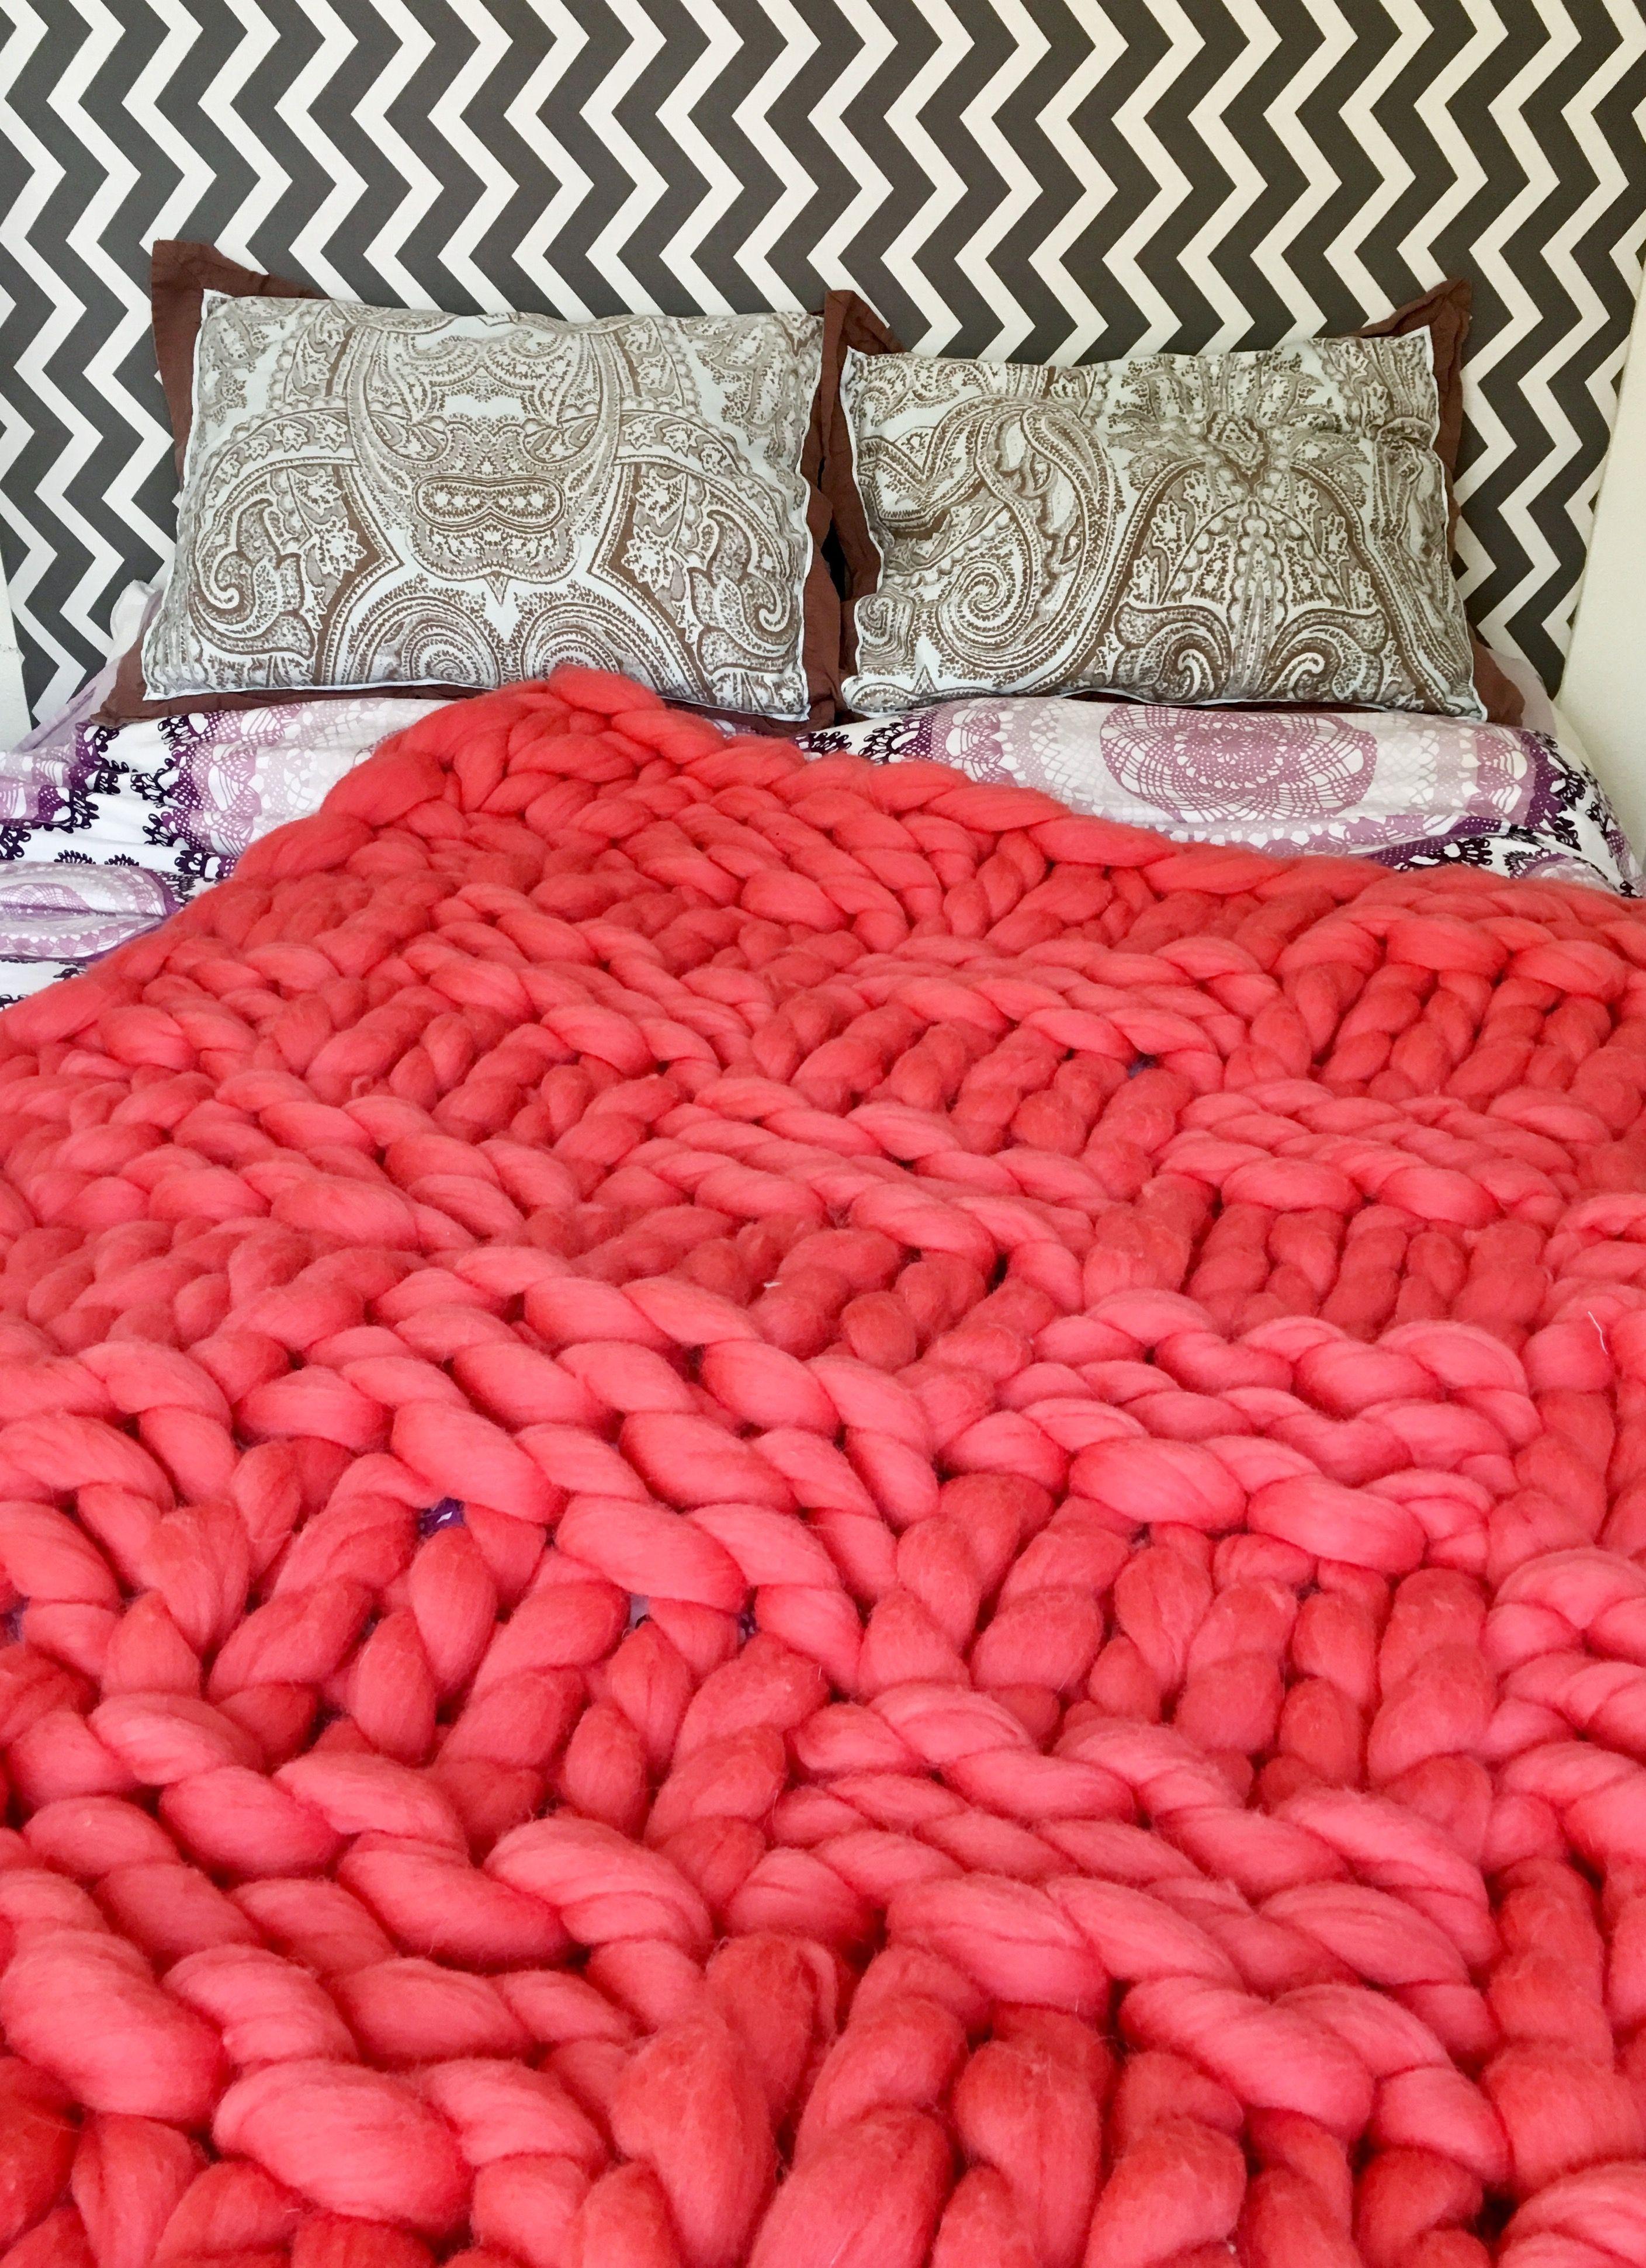 Becozi Is A Home For Chunky Merino Wool Blankets, Super